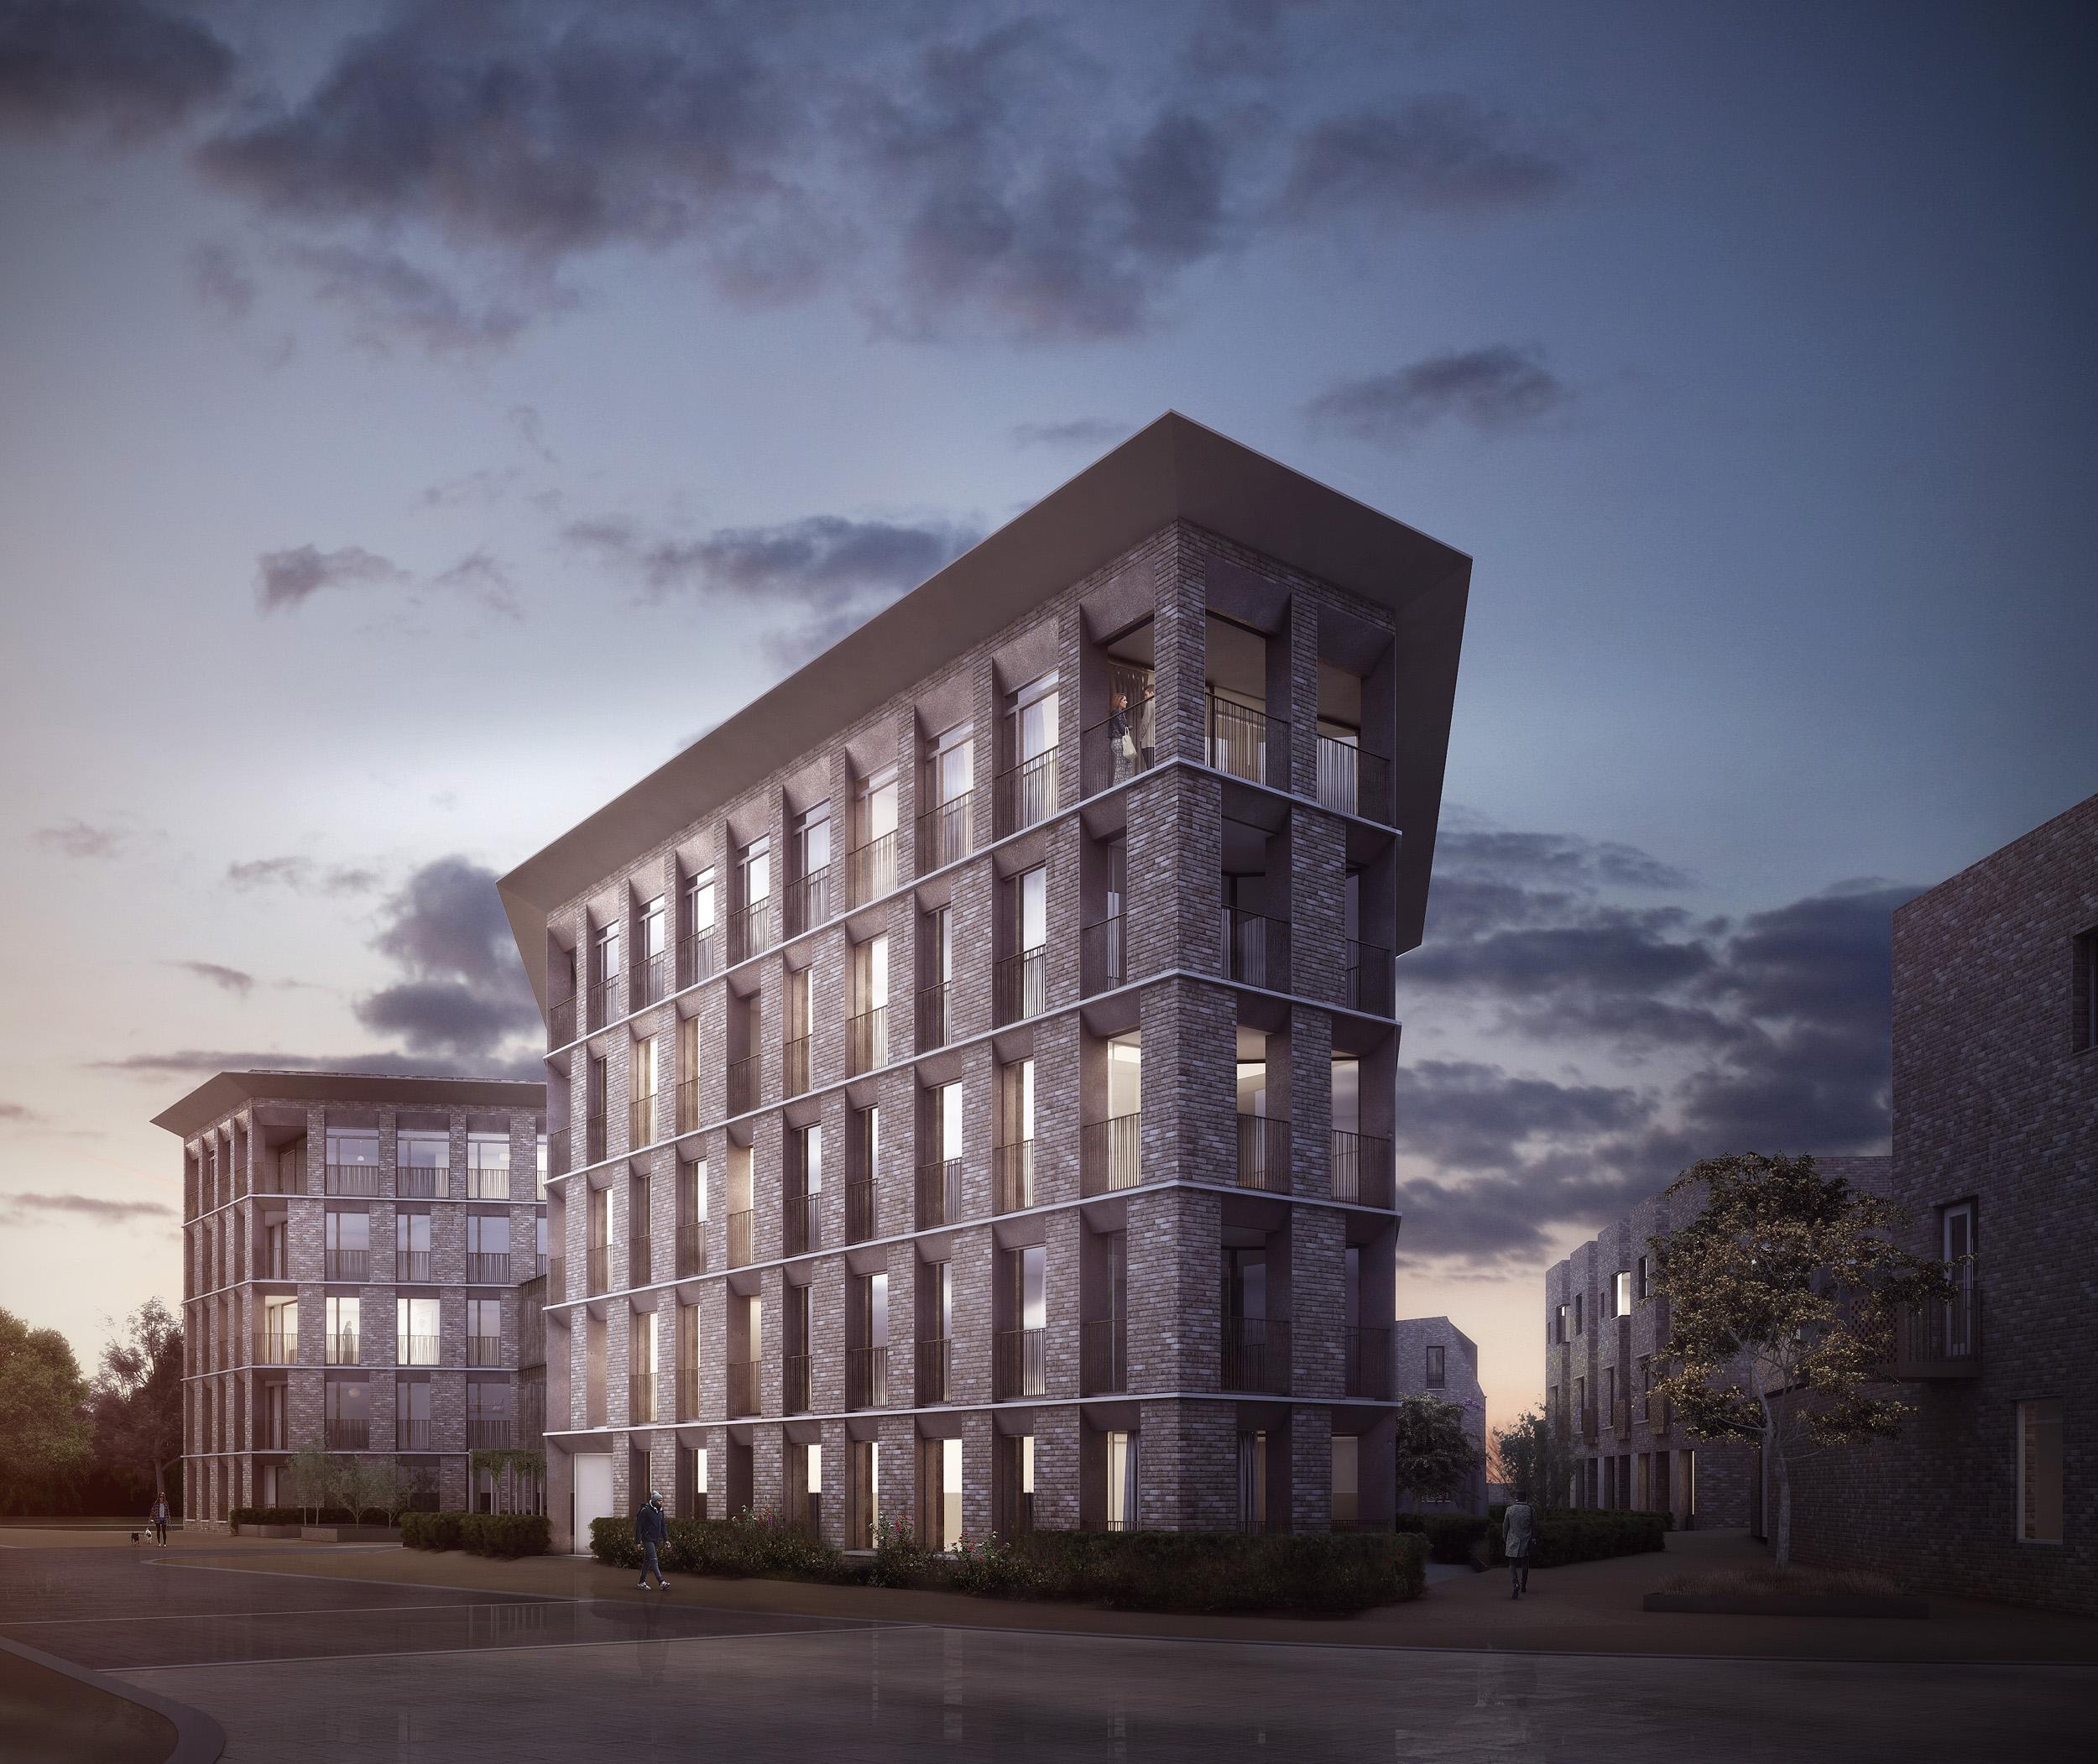 University Court Apartments: Alison Brooks Architects